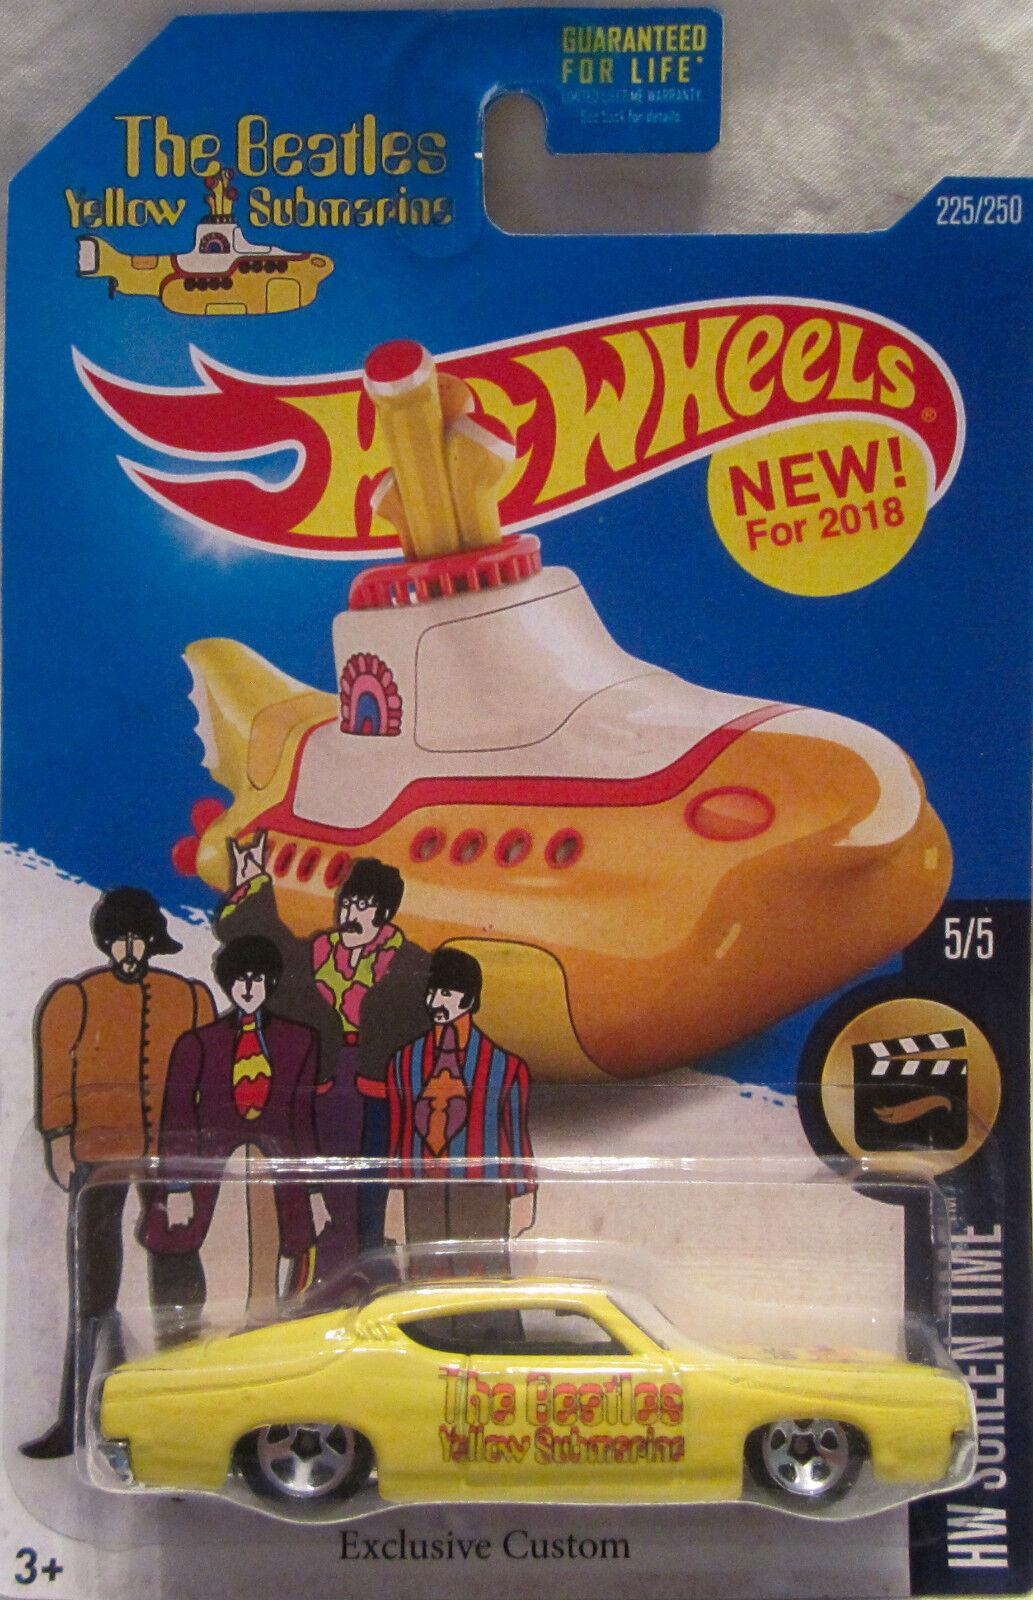 Hot Wheels Personnalisé Ford Torino Tailledega The Beatles Jaune Sous-Marin